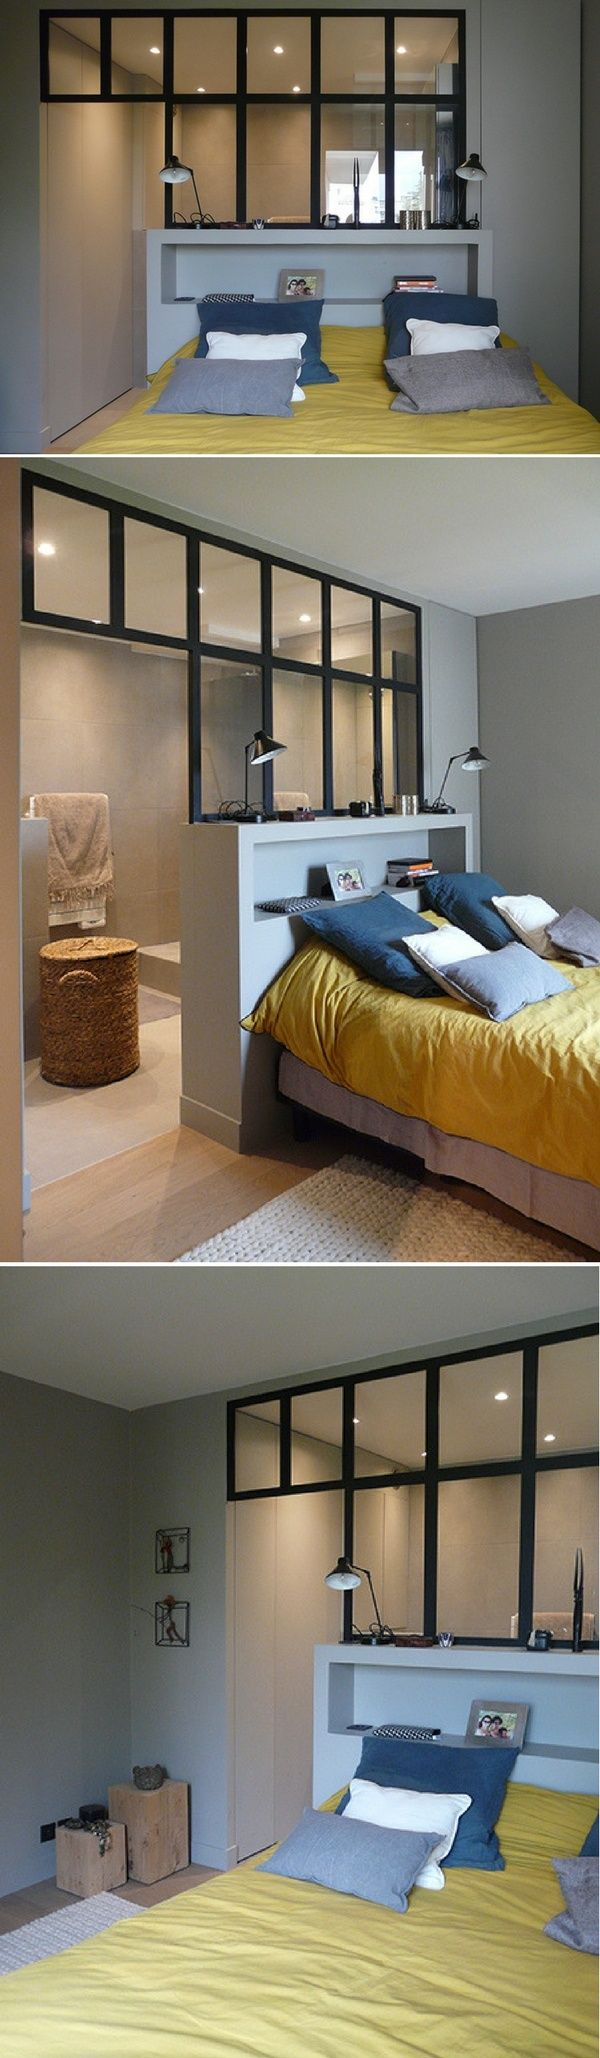 La Verri Re Atelier Dans La Salle De Bains 26 Id Es Bedrooms